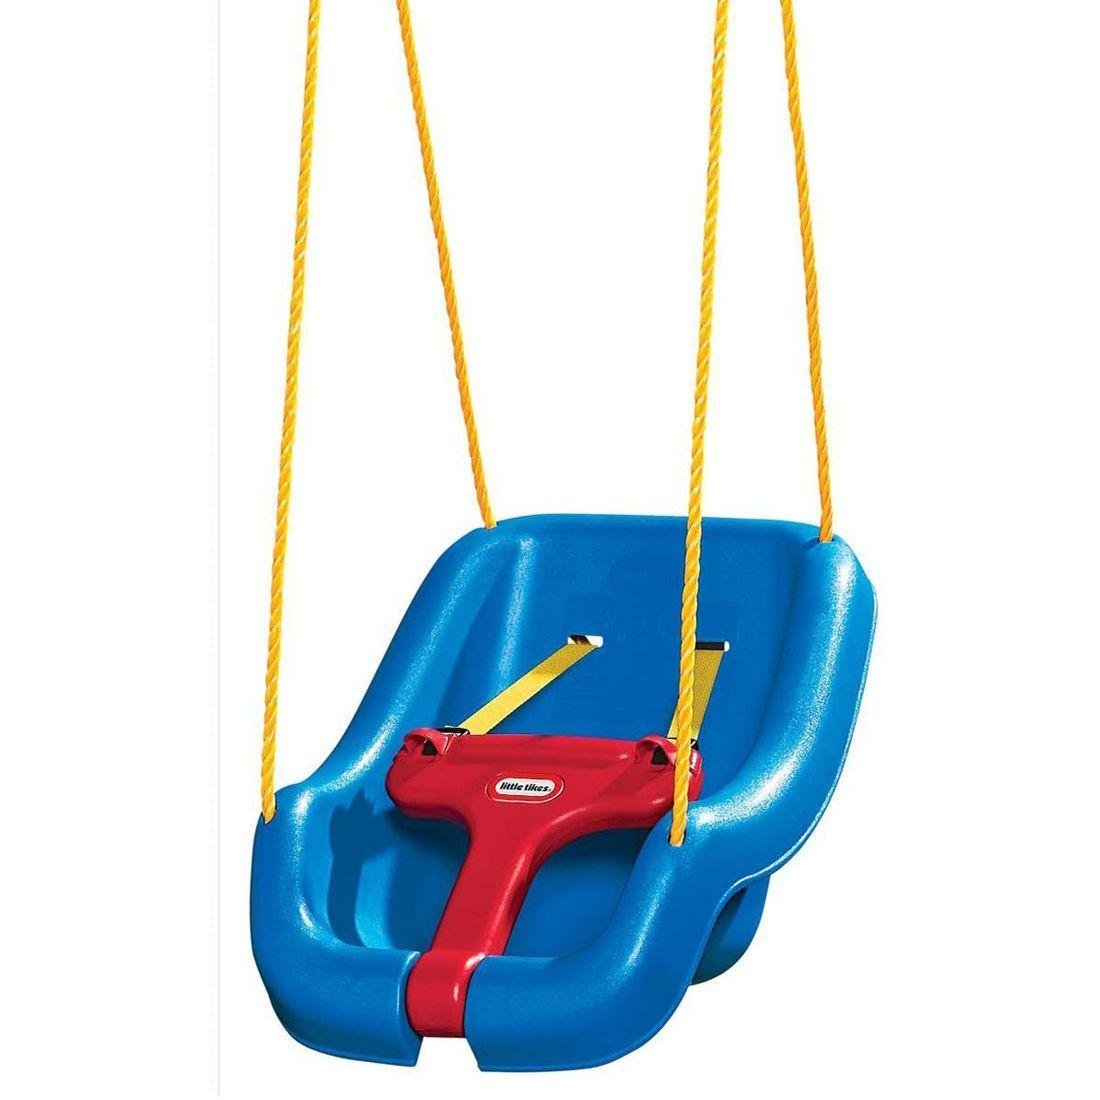 Little Tikes 2-in-1 Snug 'n' Secure Grow with Me Swing